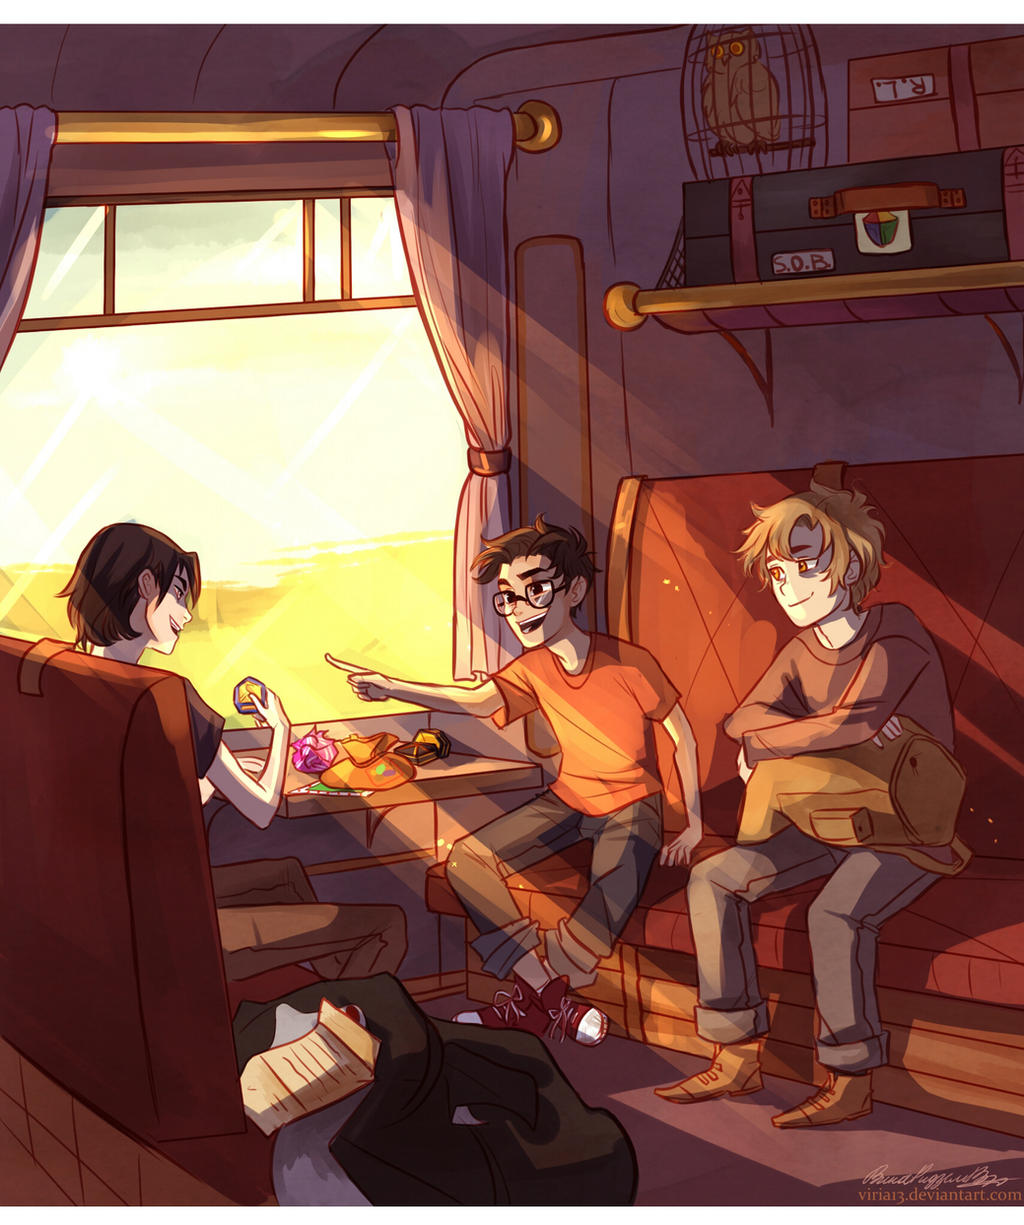 sun-filled memories by viria13